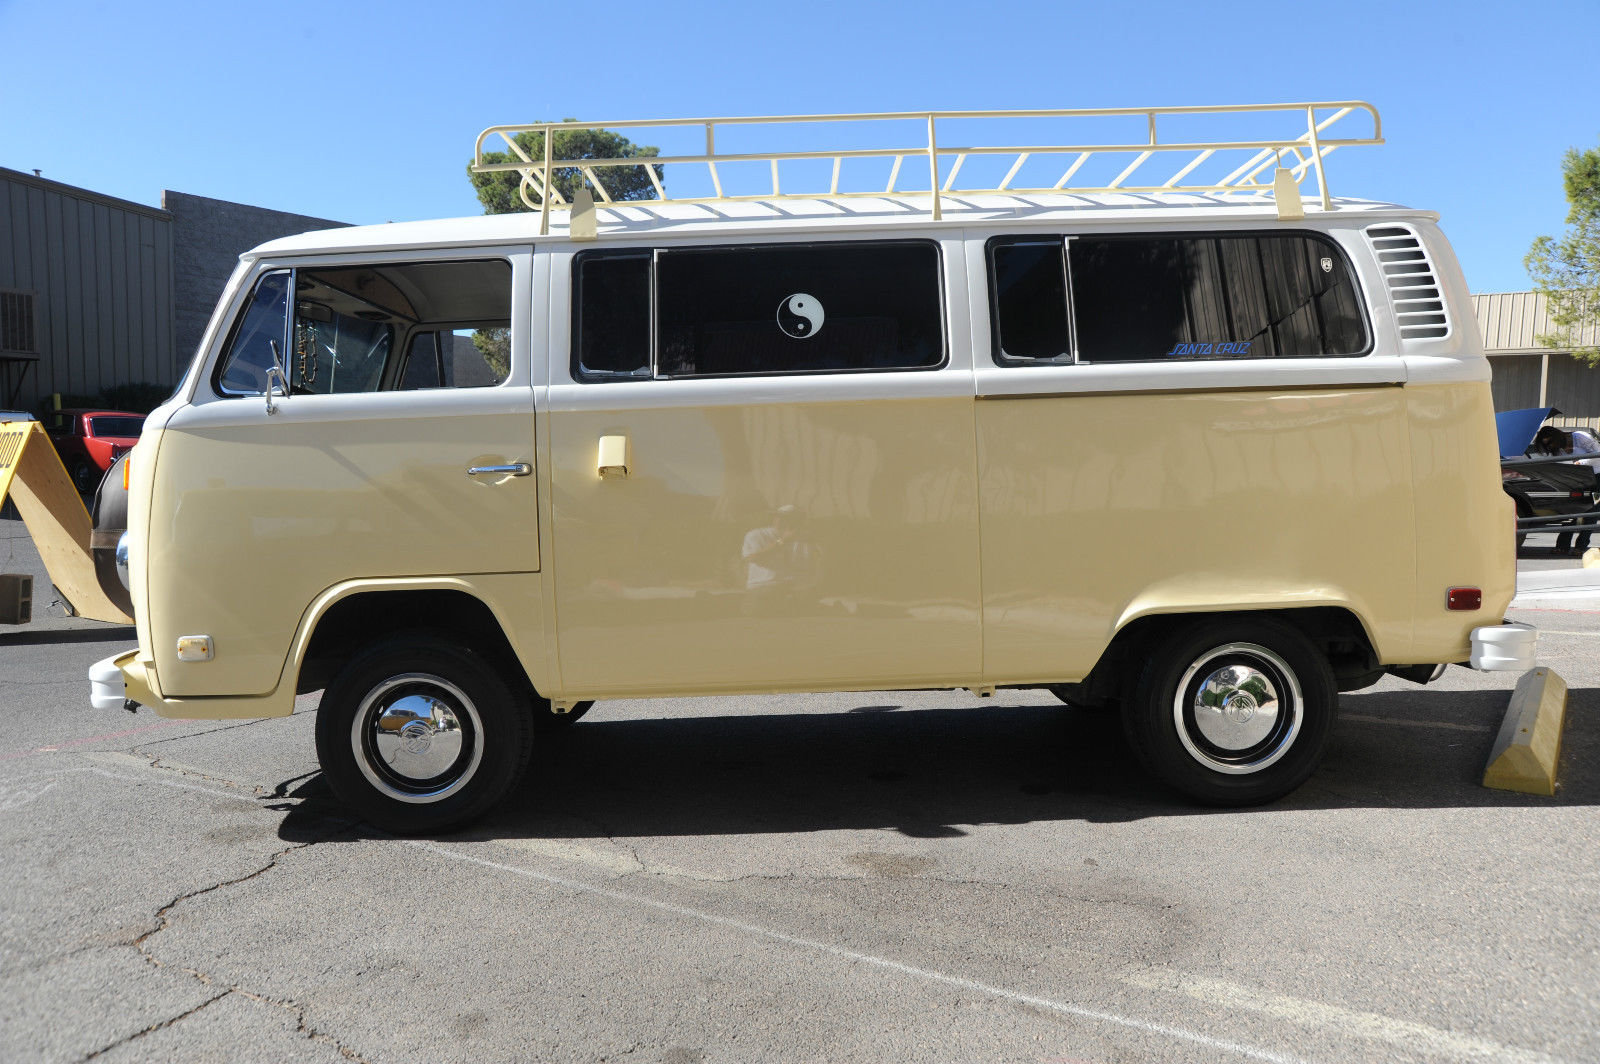 Wow 1974 Vw Kombi Hippie Bus New Paint Nice Interior Runs Great